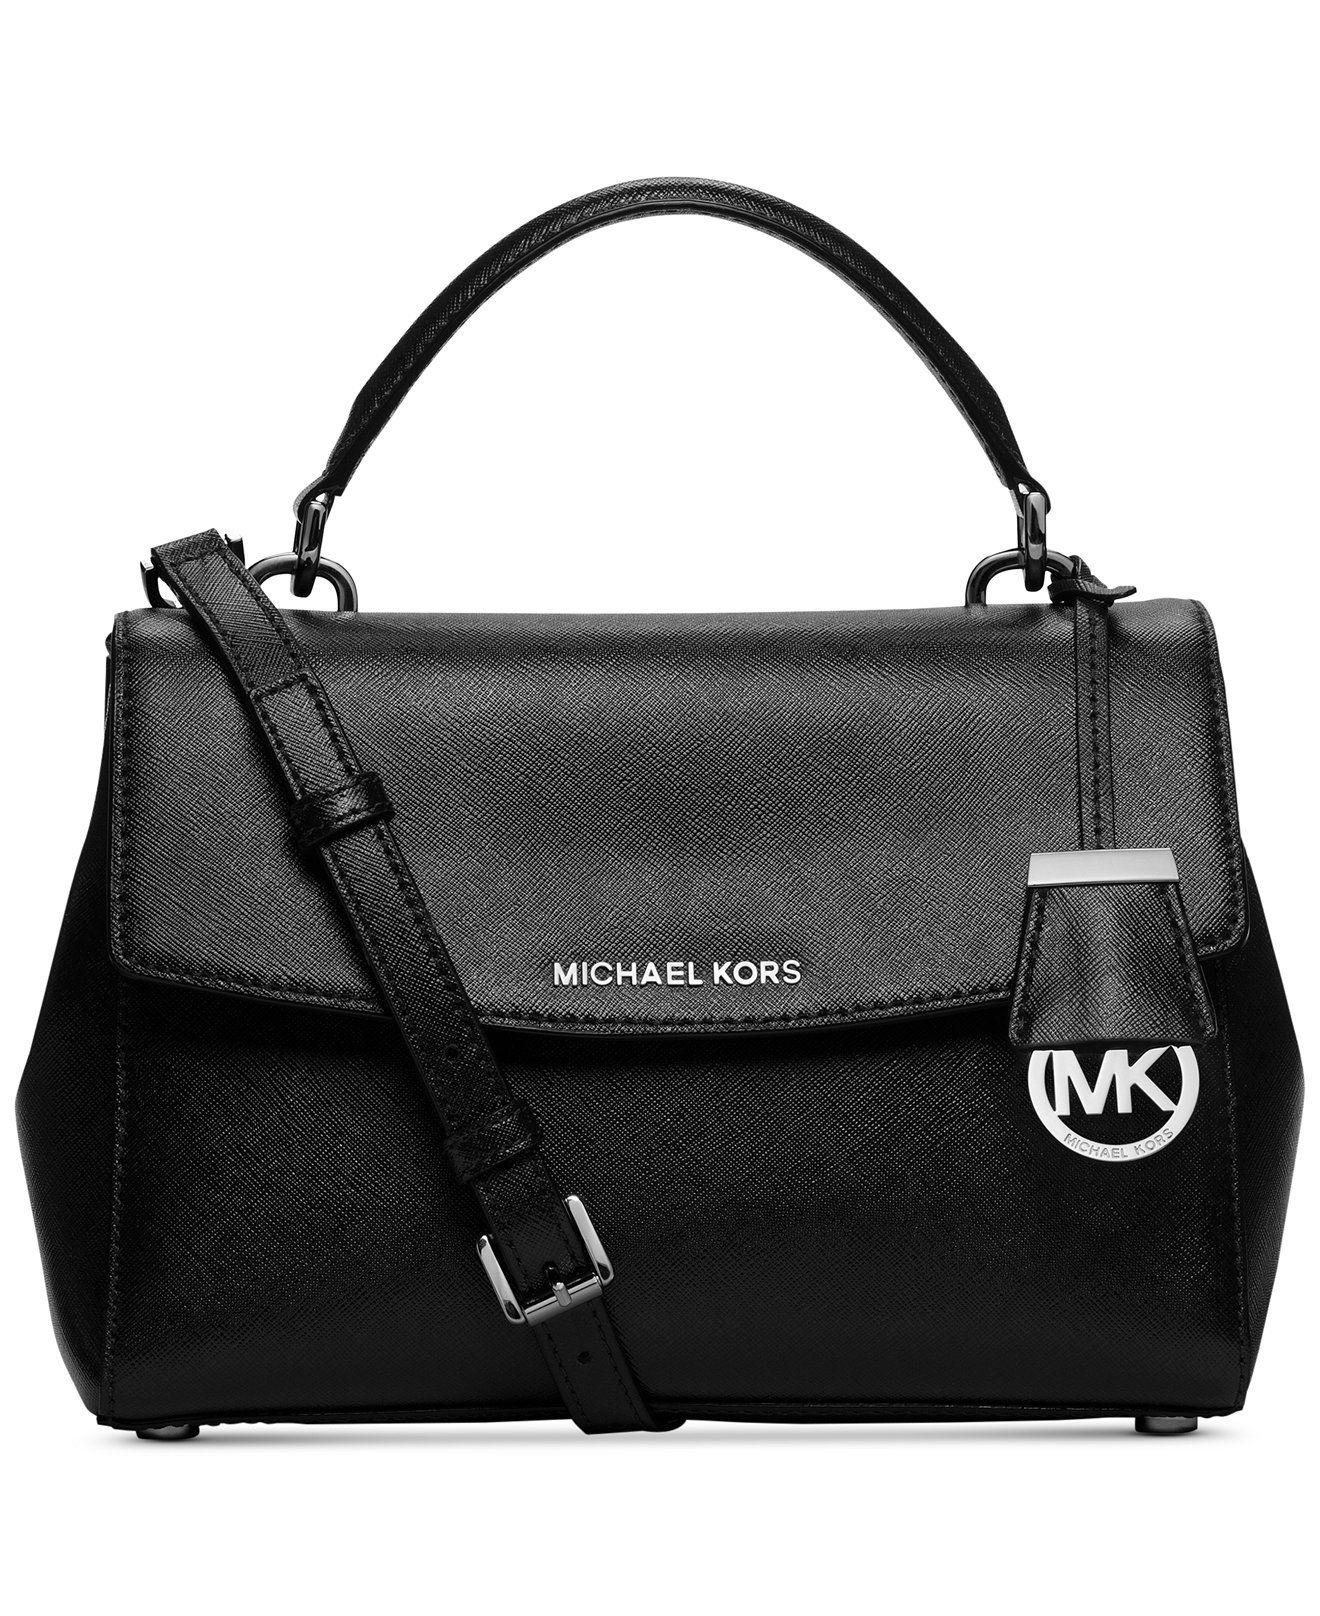 34afd04d95d2 MICHAEL Michael Kors Ava Patent Small Top Handle Satchel Black Saffiano  Leather Shoulder Strap Handbag Designer Fashion Adjustable Flap